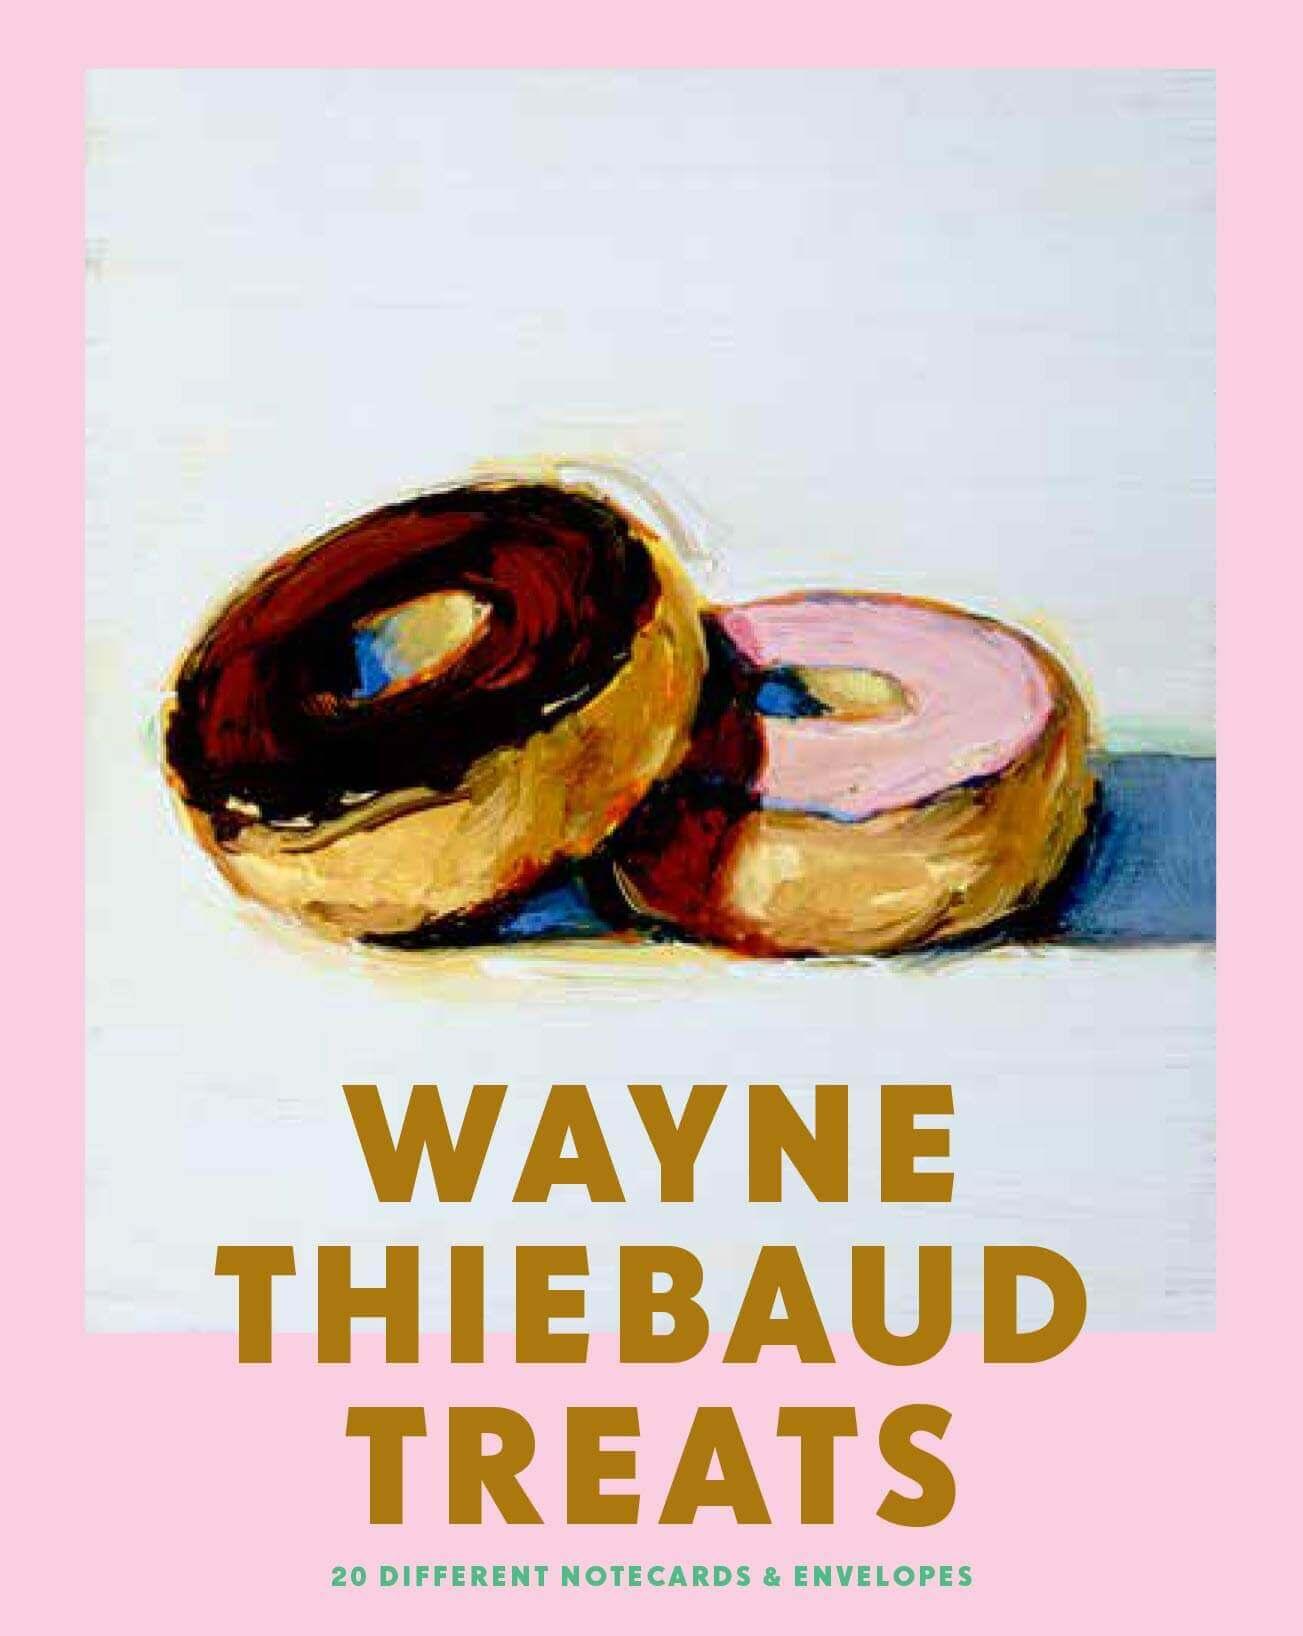 Wayne Thiebaud Treats